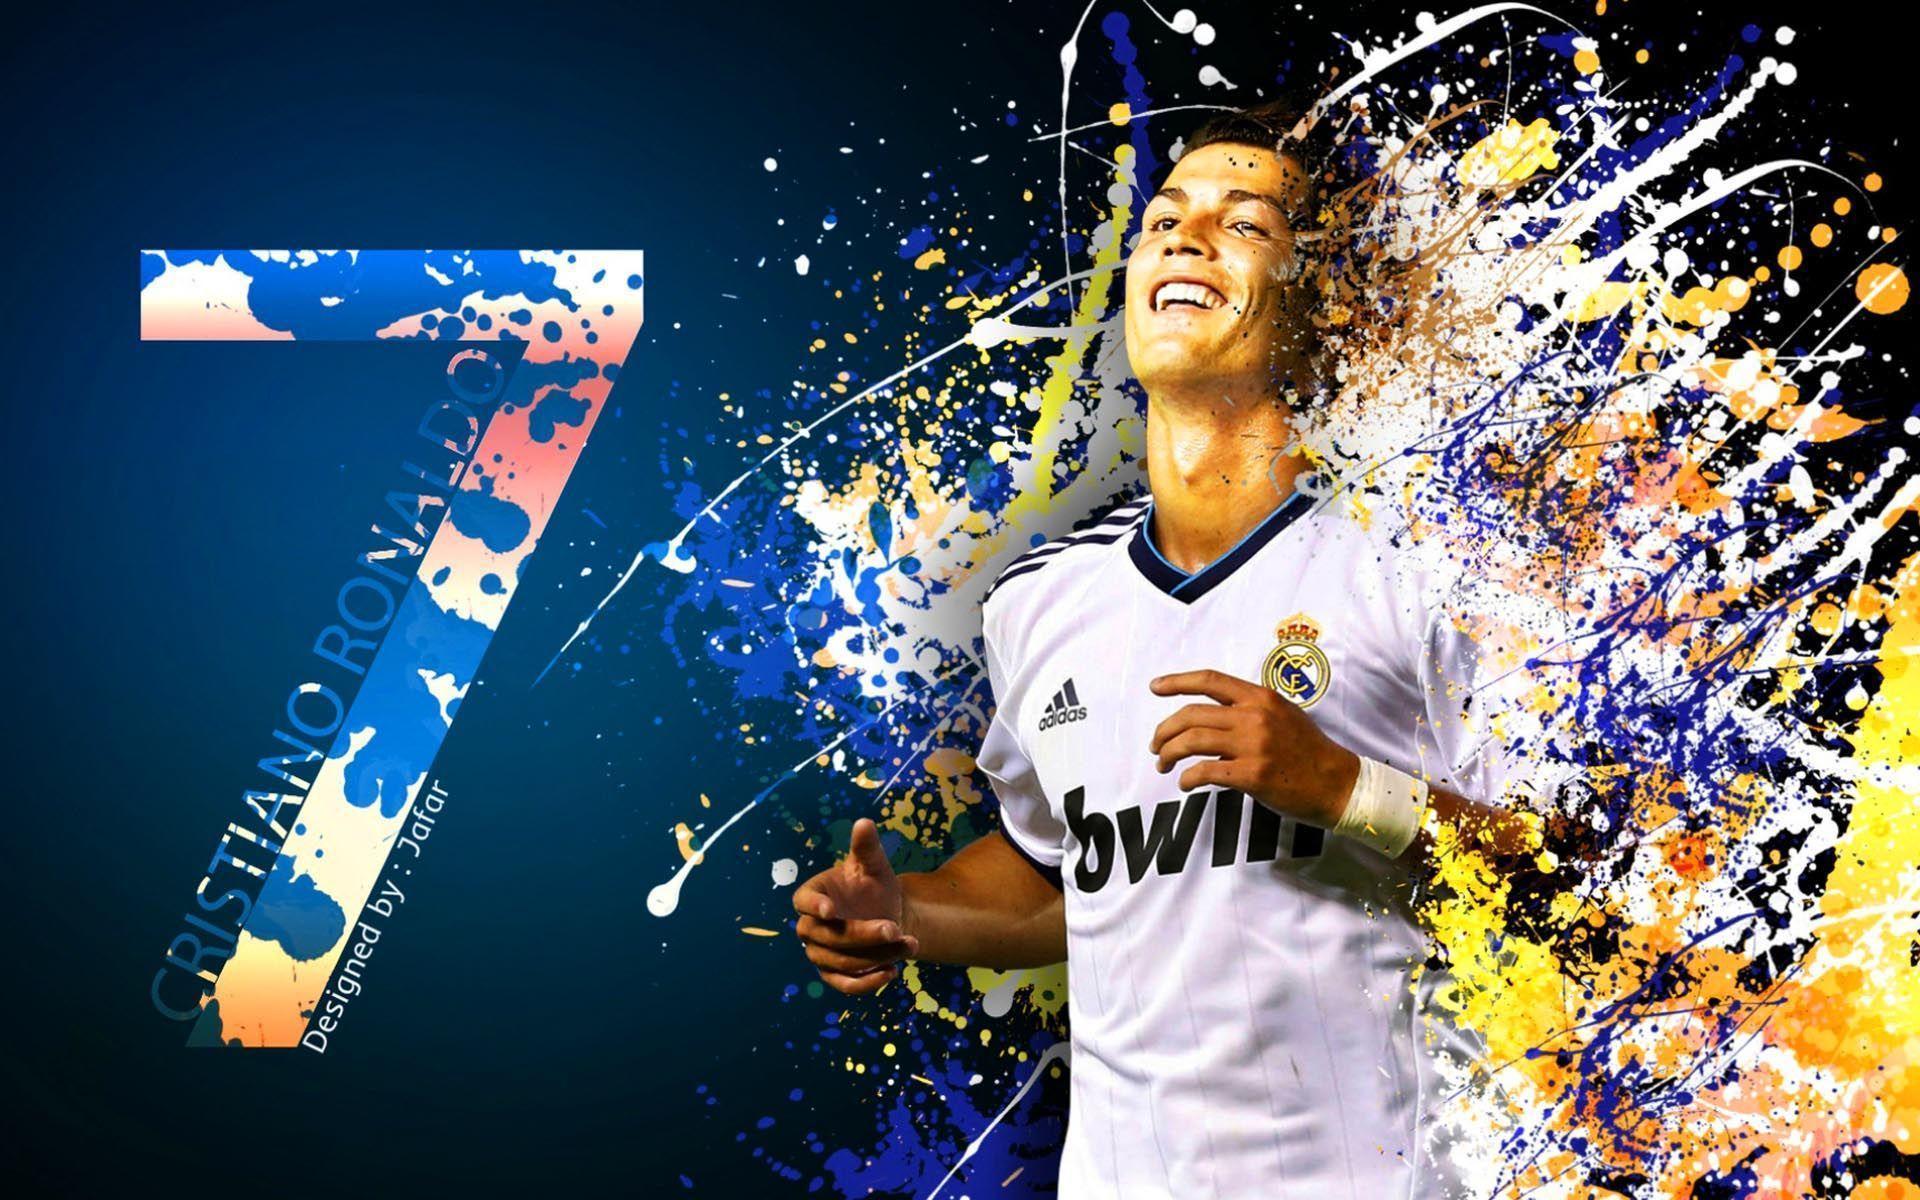 Cristiano Ronaldo 7 Wallpapers